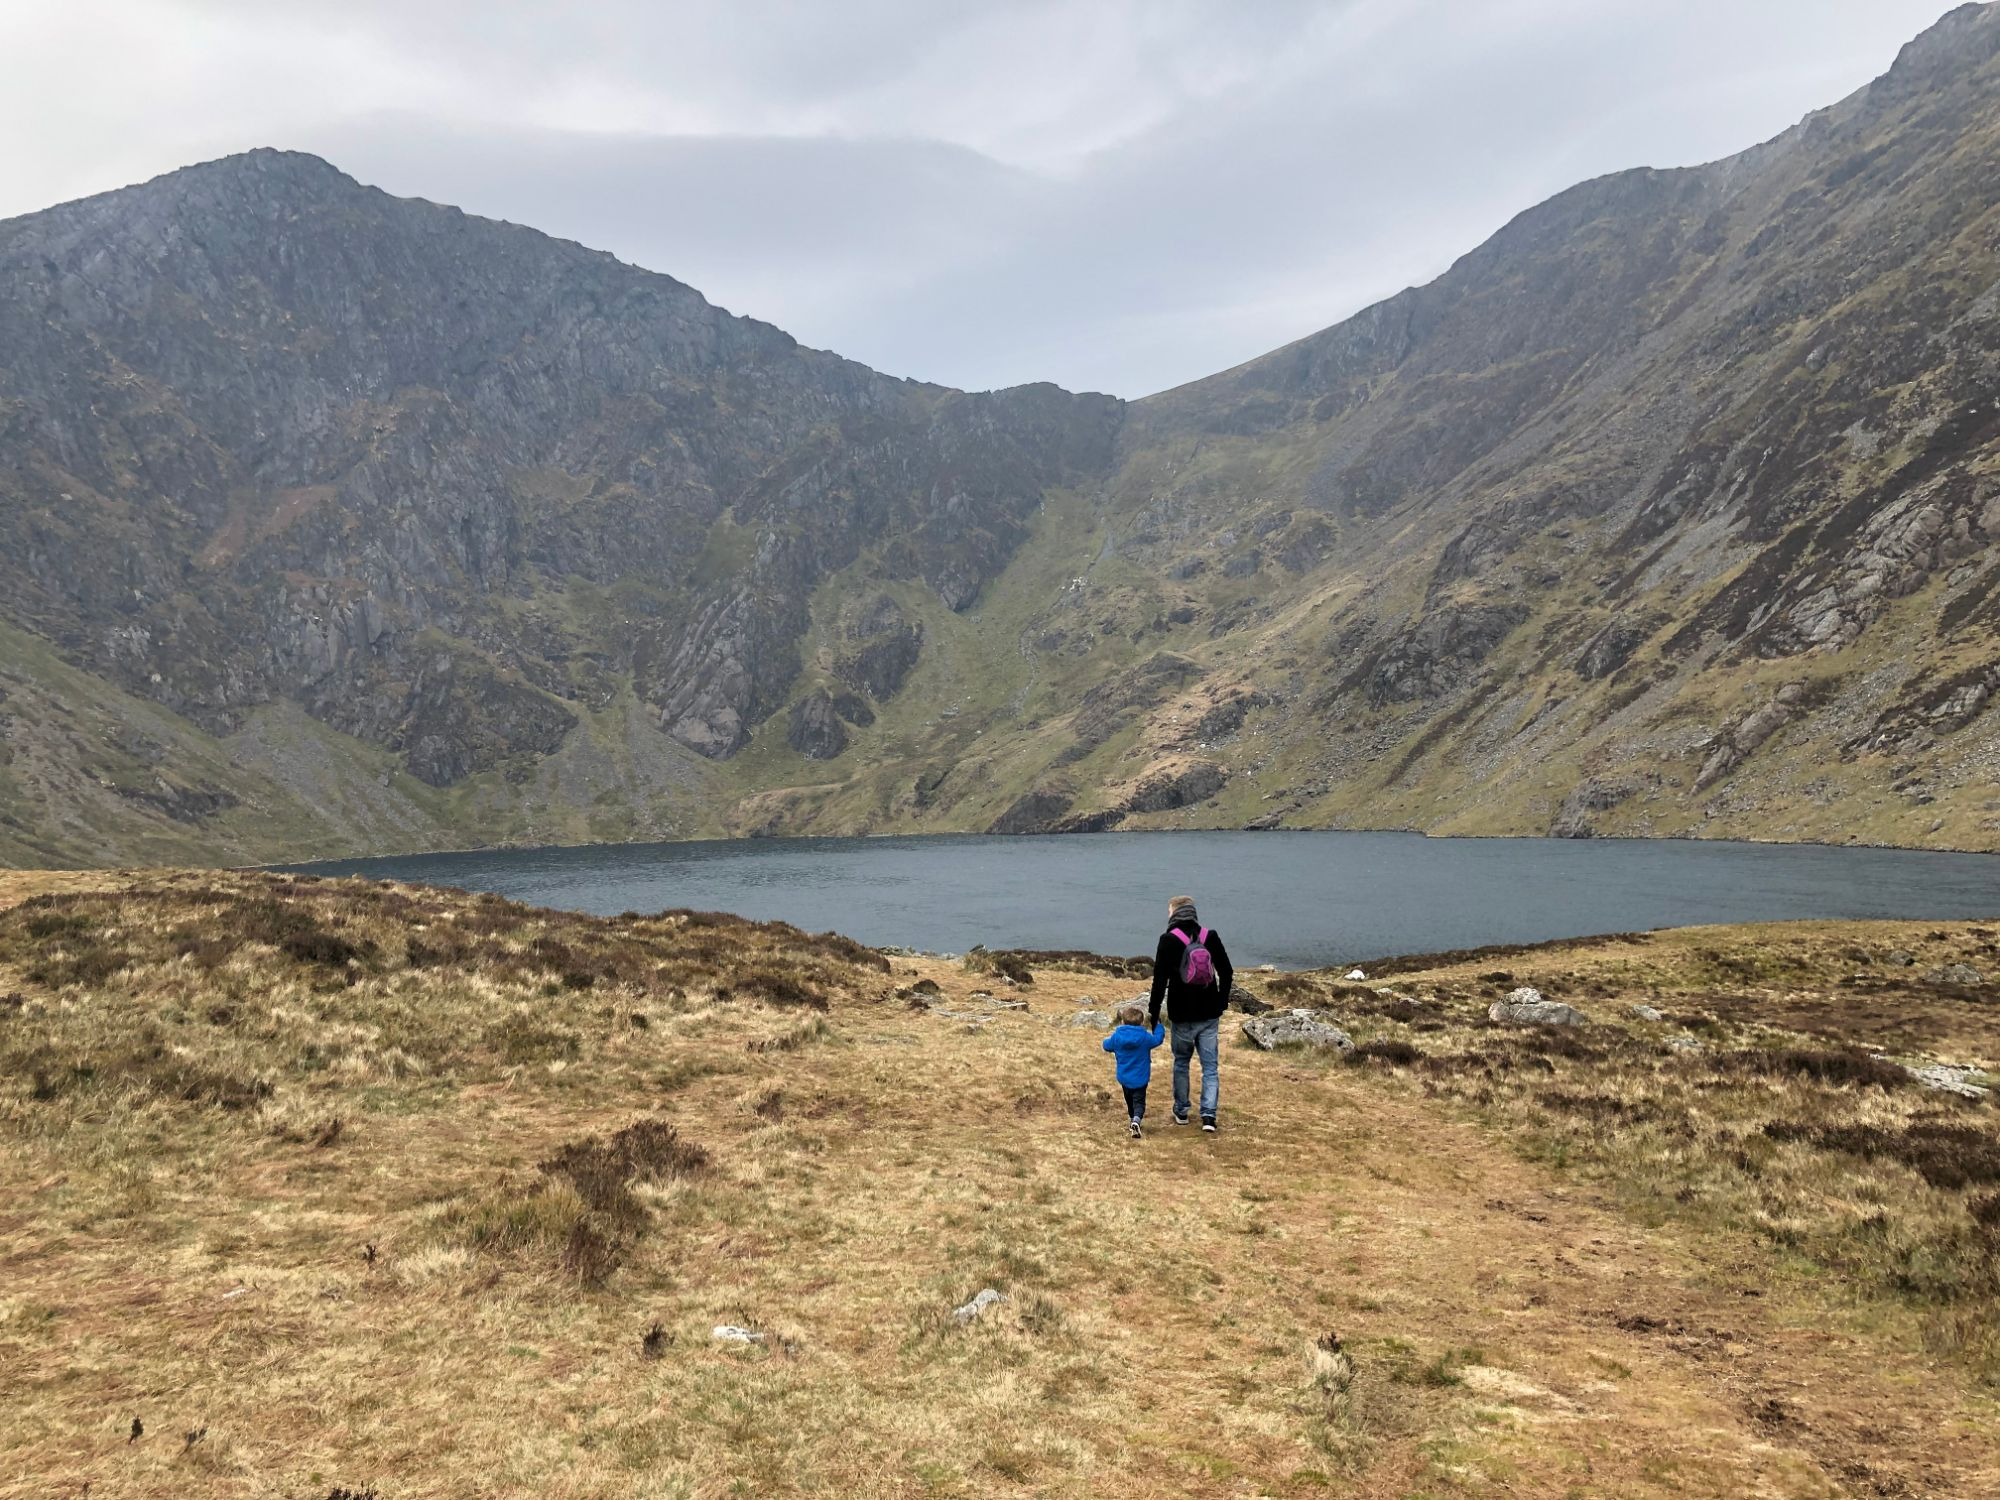 Free stock photo Cadair Idris Mountain Snowdonia Wales lake